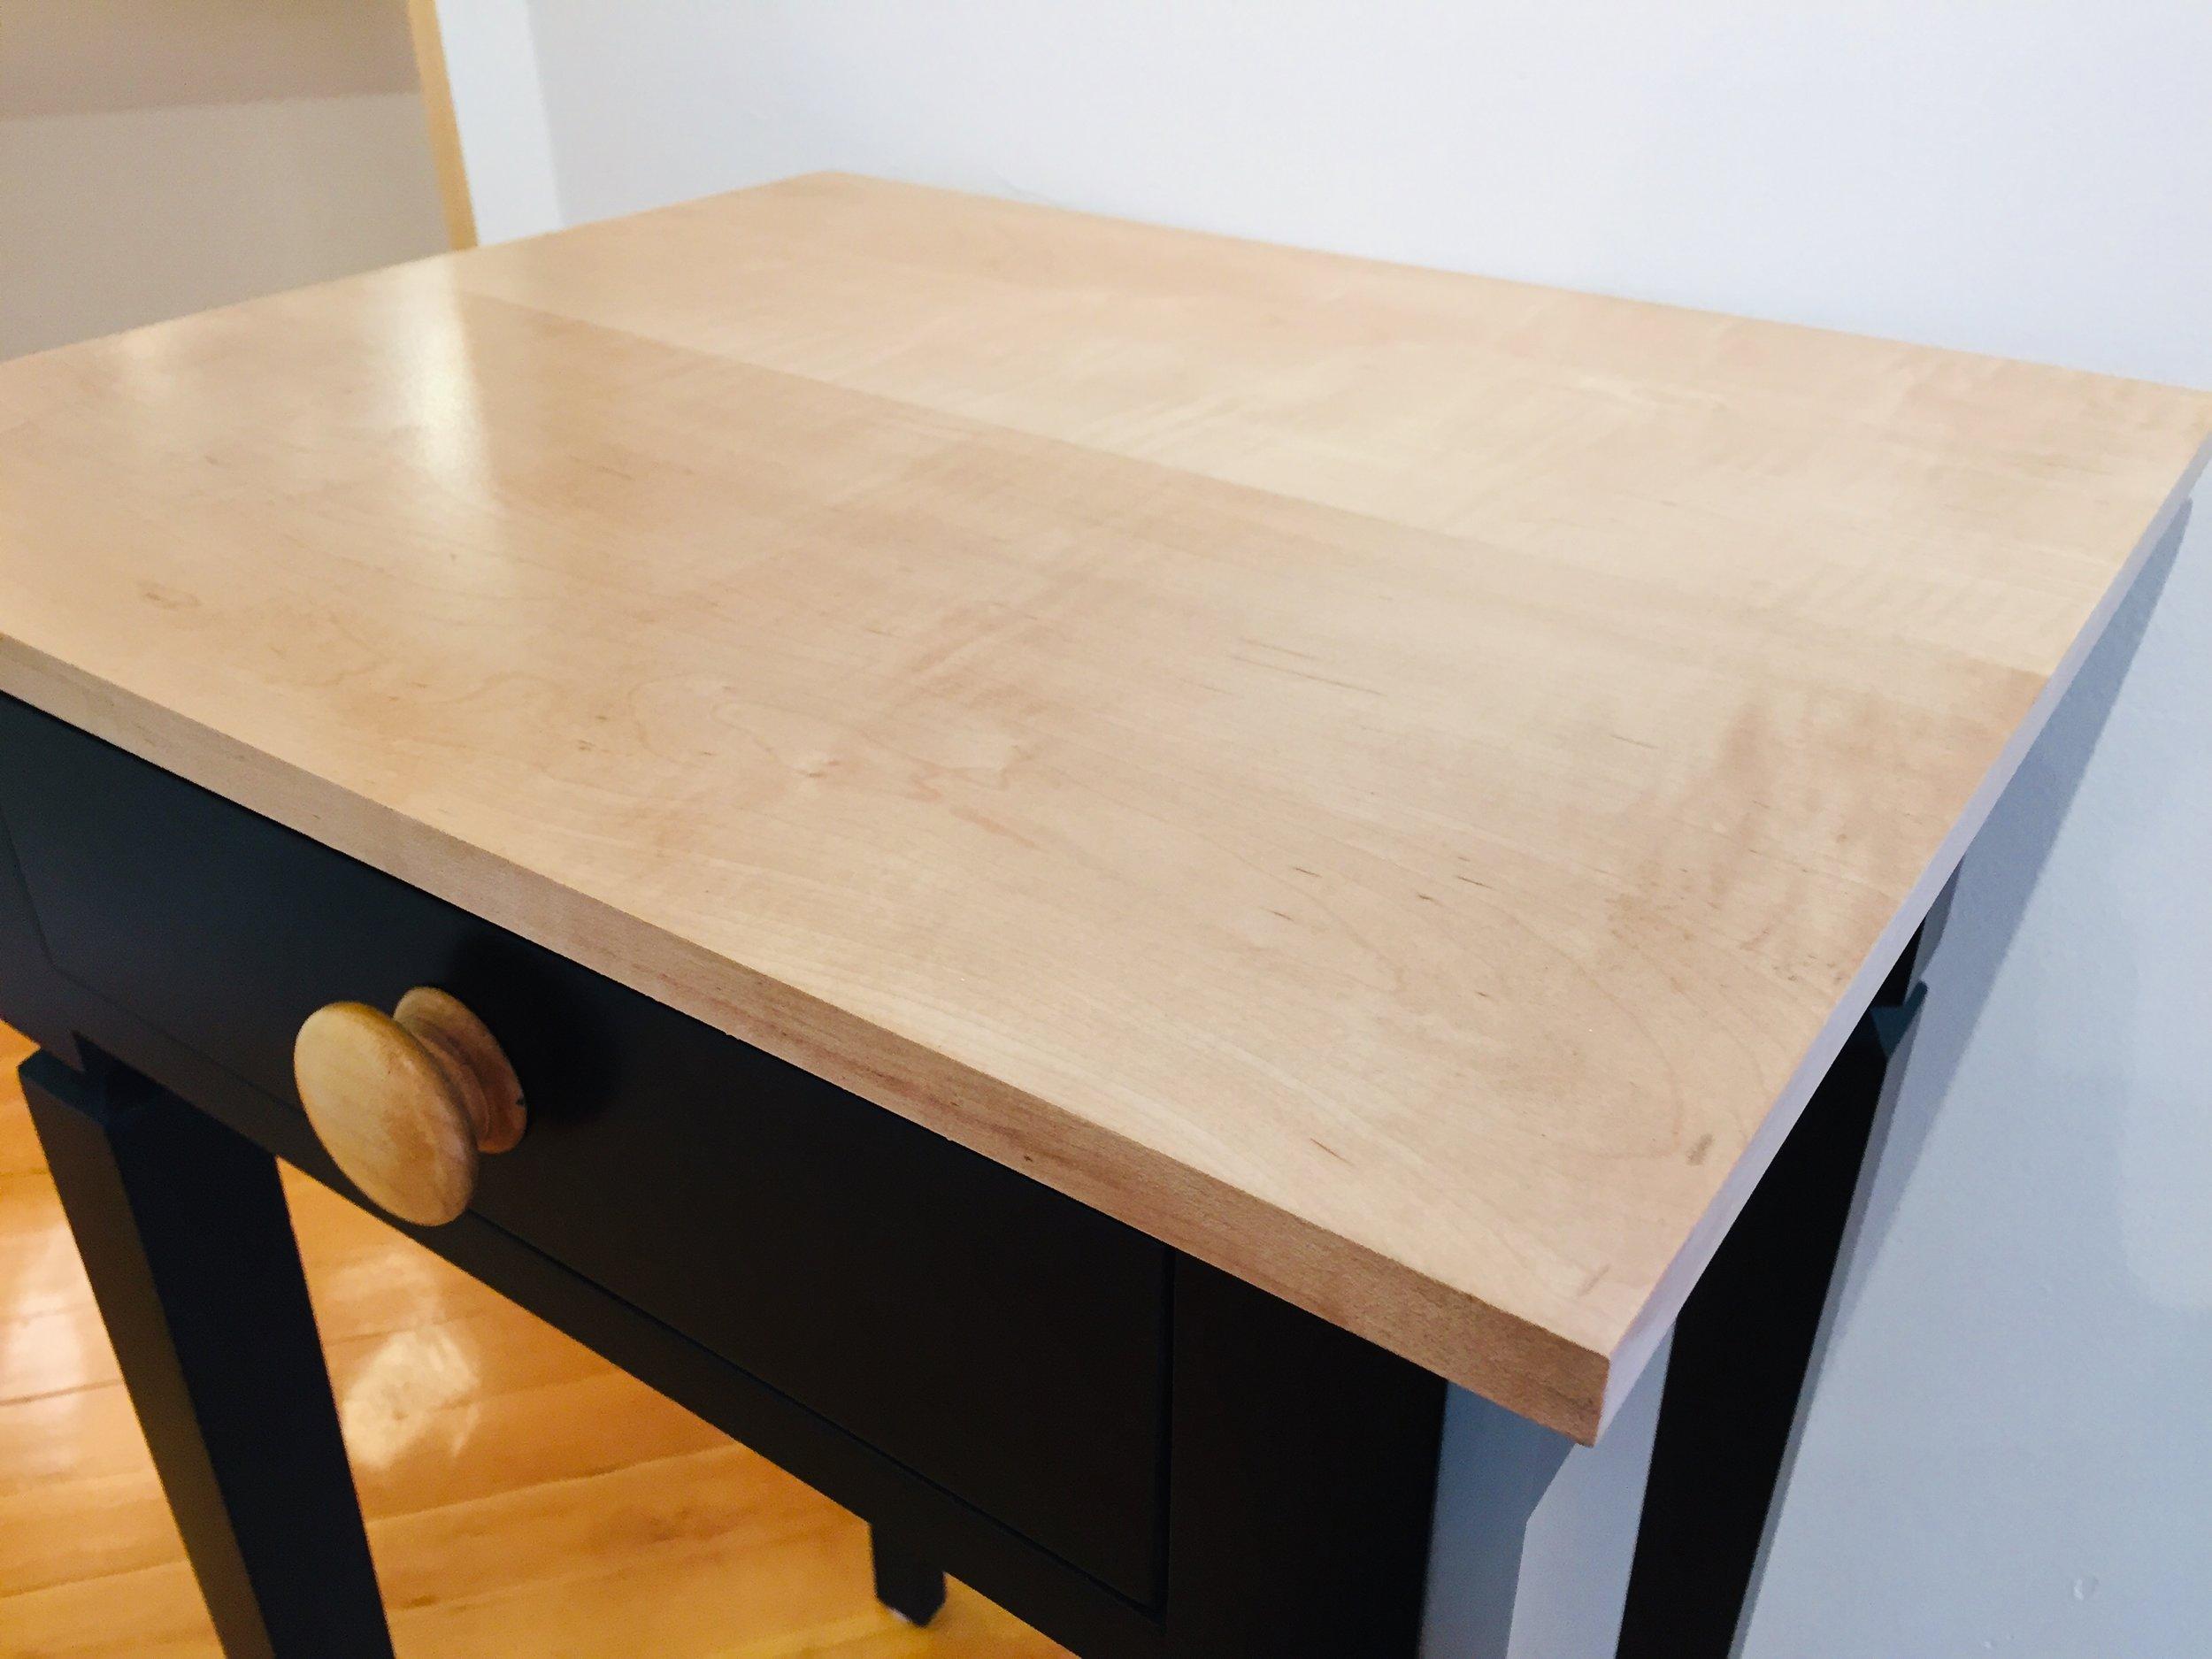 Ebonized Poplar Table $700 - Custom finishes available.